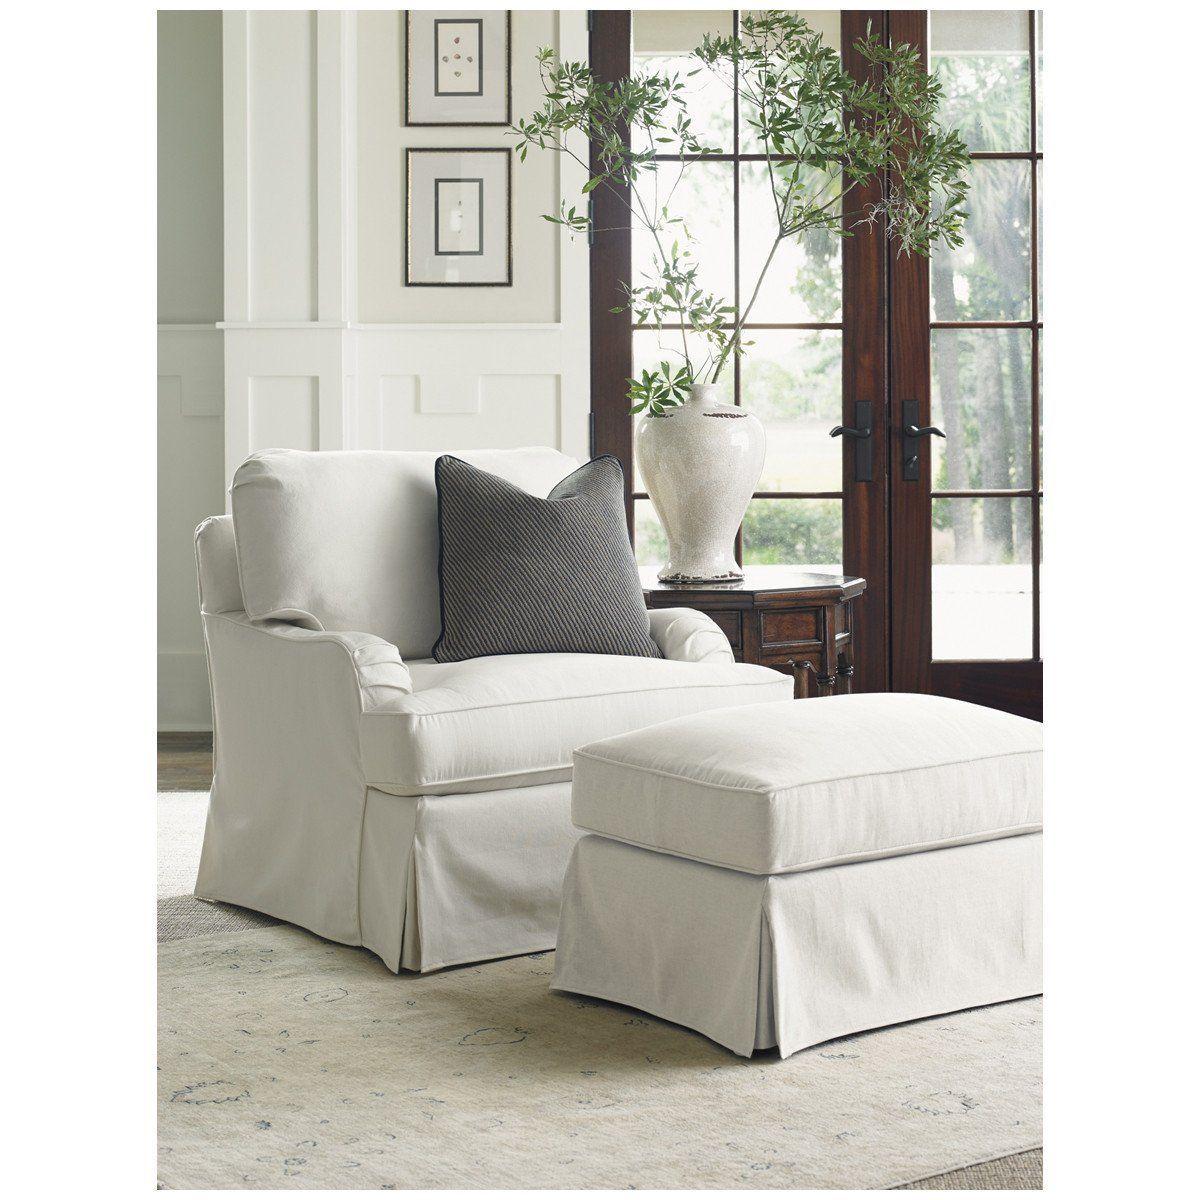 Lexington Coventry Hills Stowe Swivel Slipcover Chair